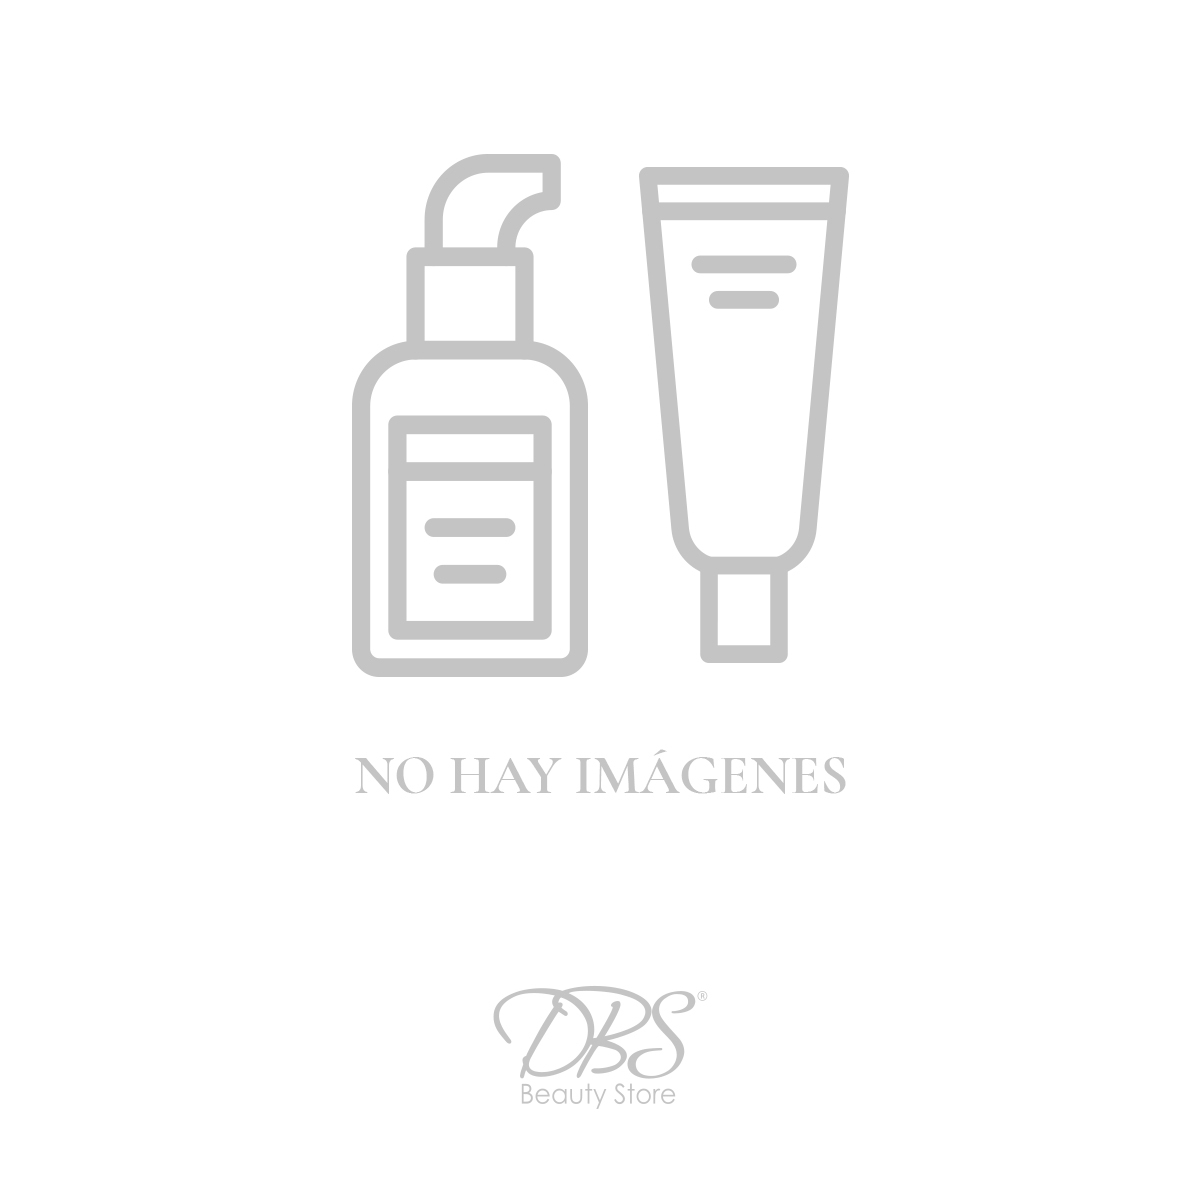 Perfume Eau de Juice - 100% Chilled Cosmopolitan